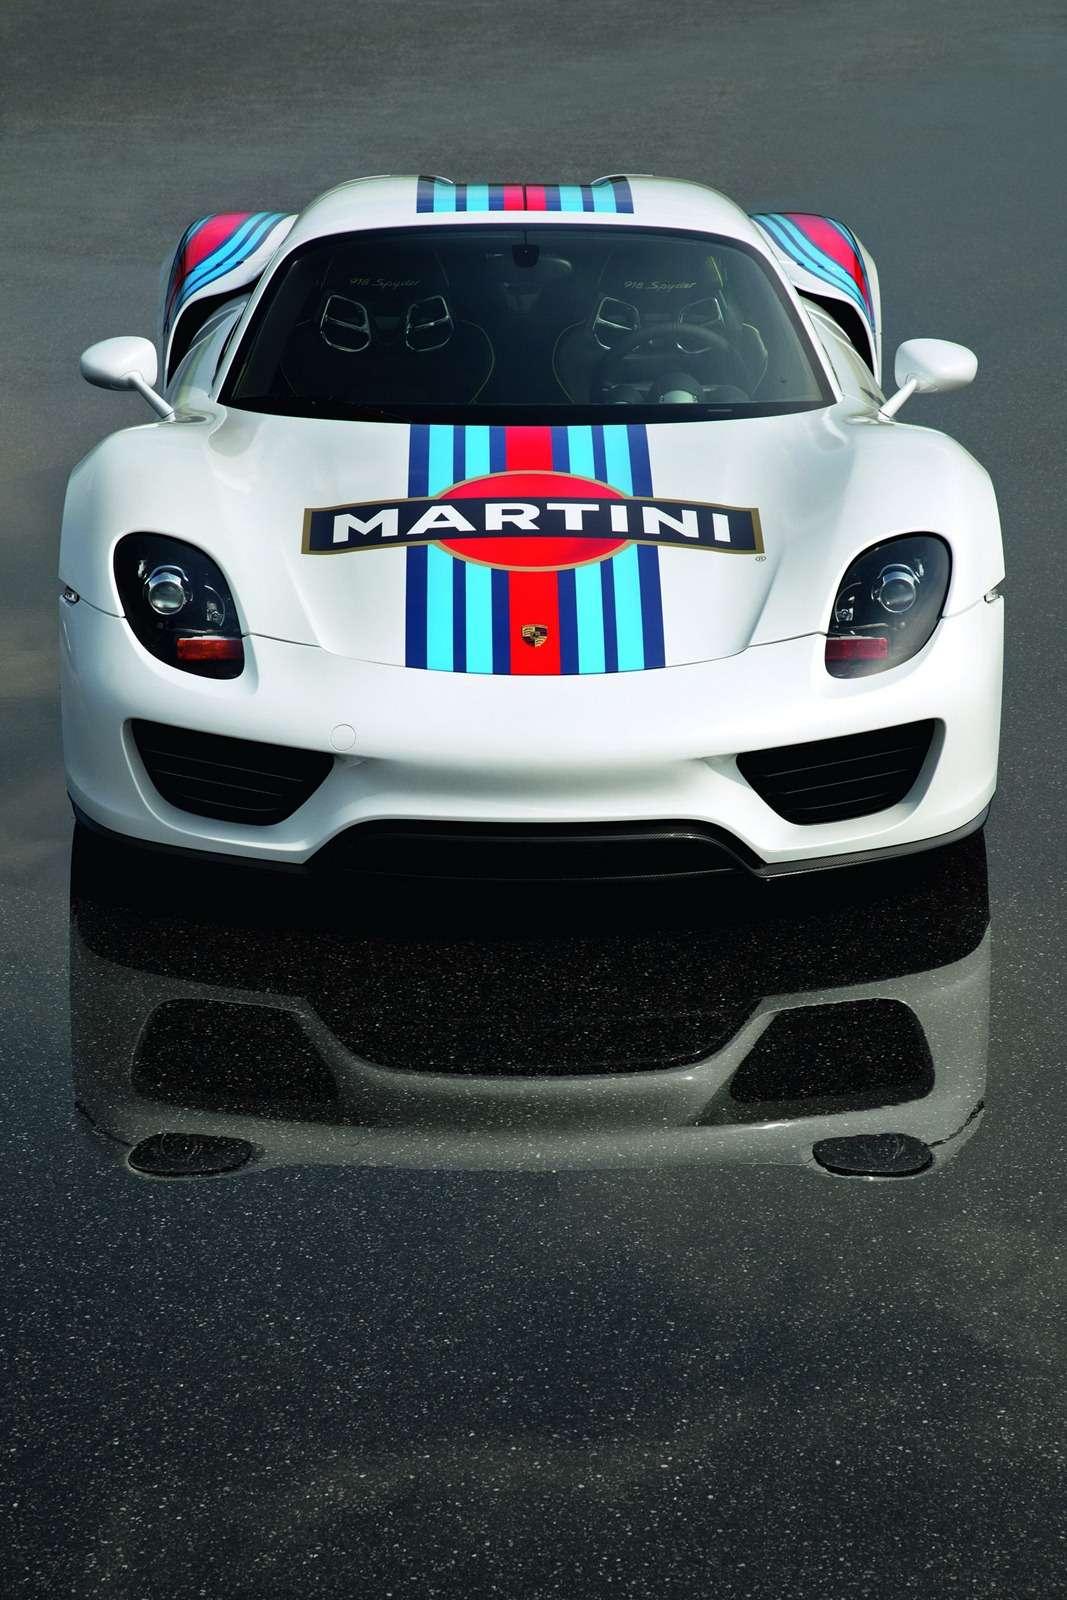 porsche-918-hybrid-martini-racing_07.jpg